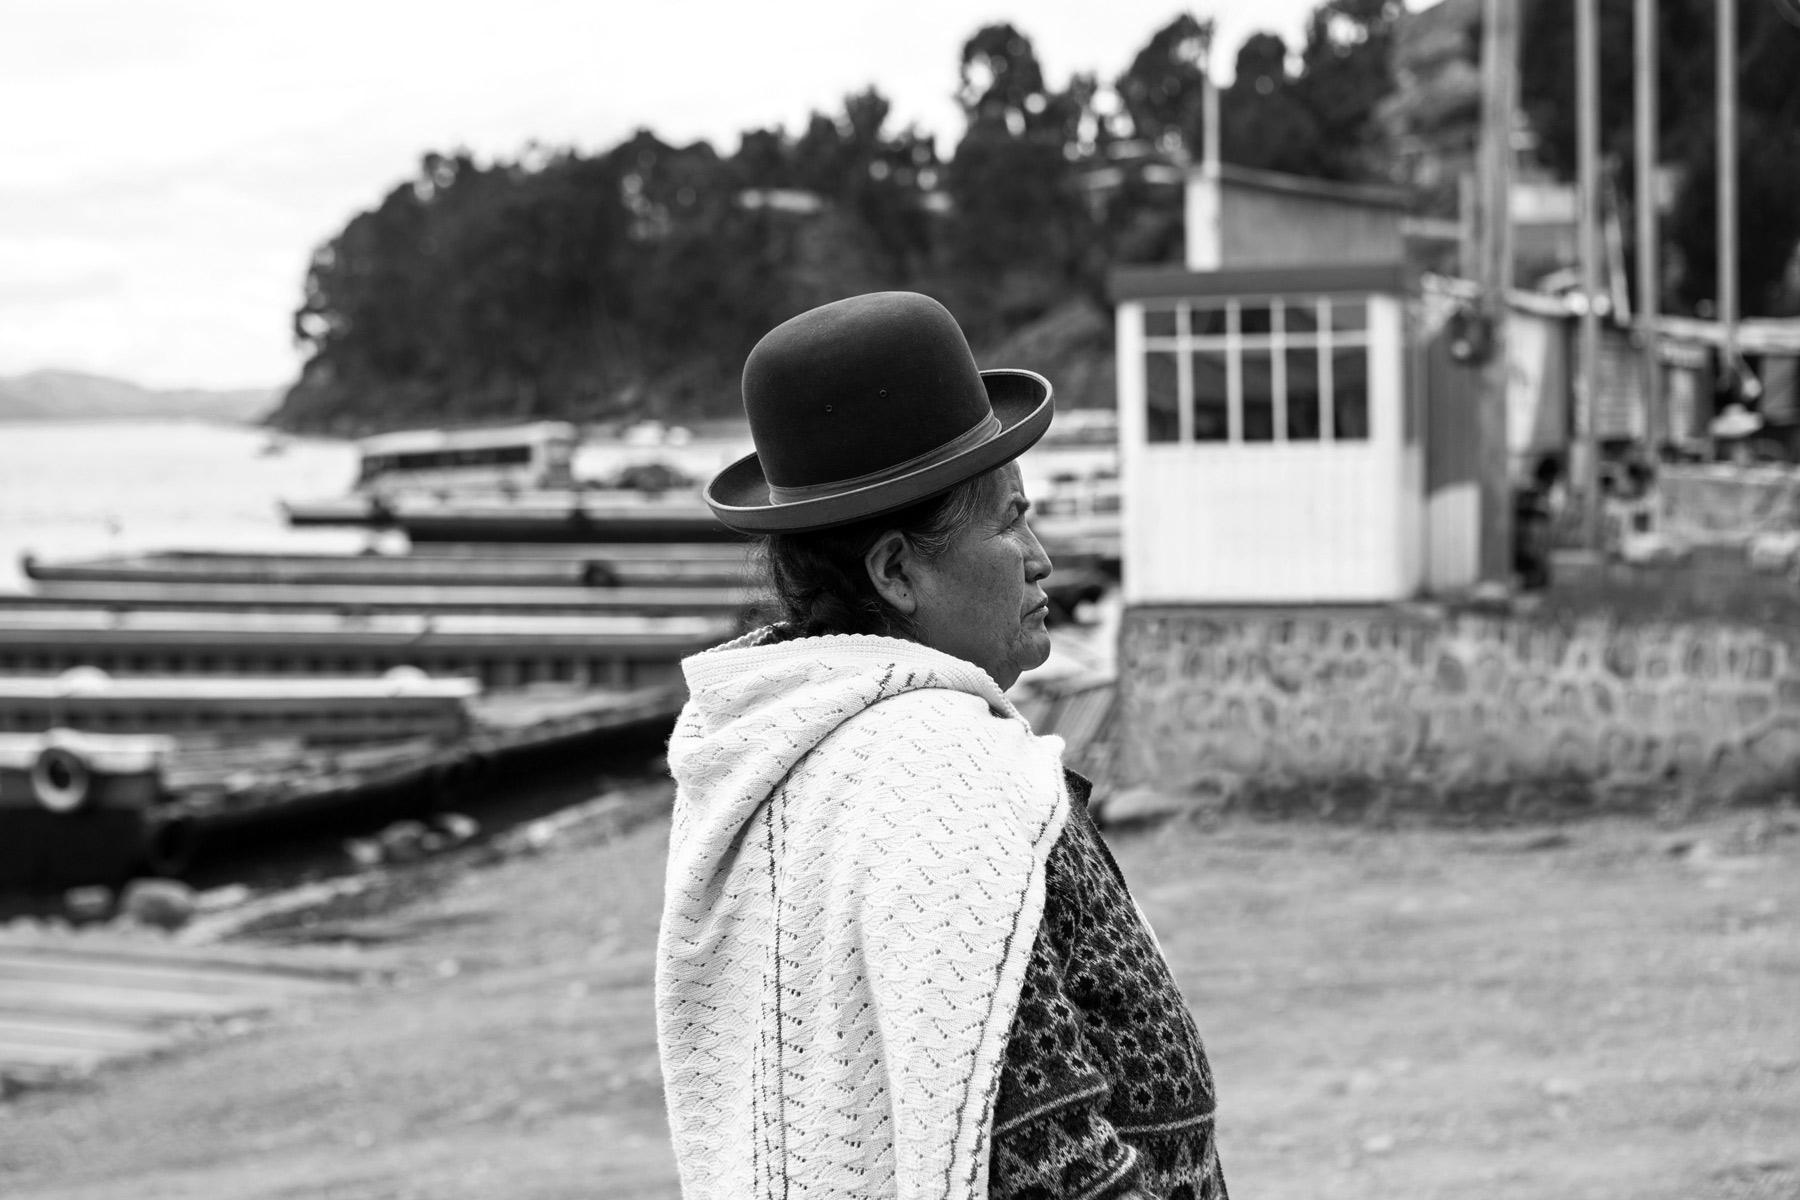 A woman wearing a bowler hat at Lake Titicaca, Peru